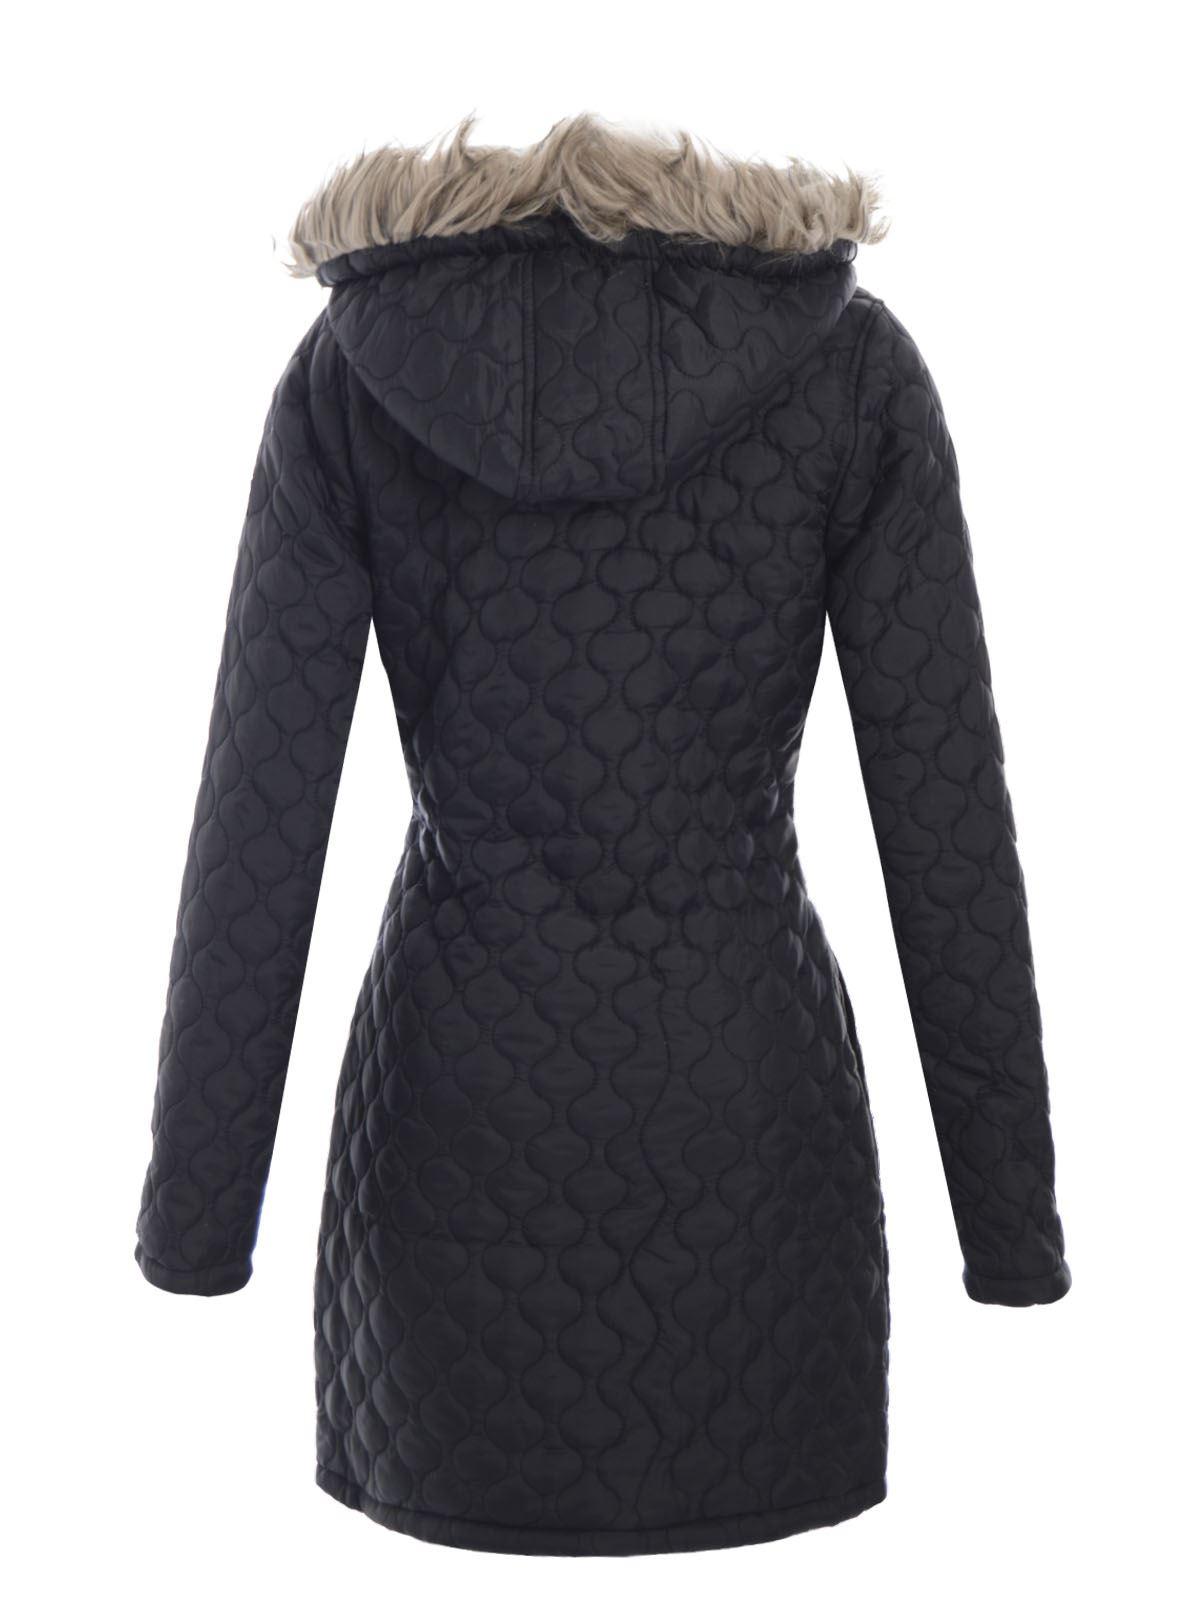 brave soul womens jacket quilted fur hooded coat ladies. Black Bedroom Furniture Sets. Home Design Ideas